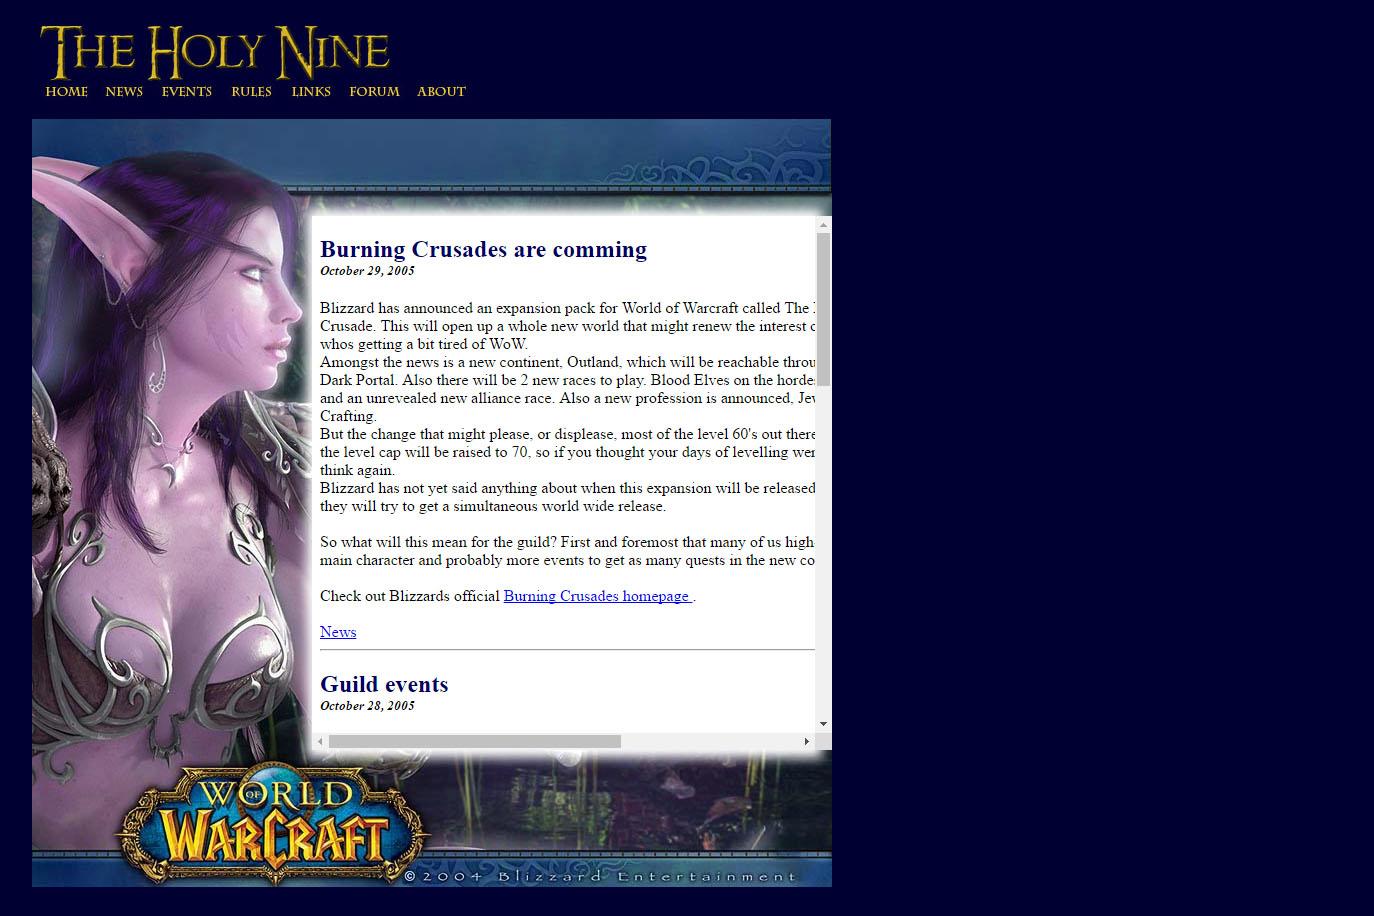 Website for a World of Warcraft guild.